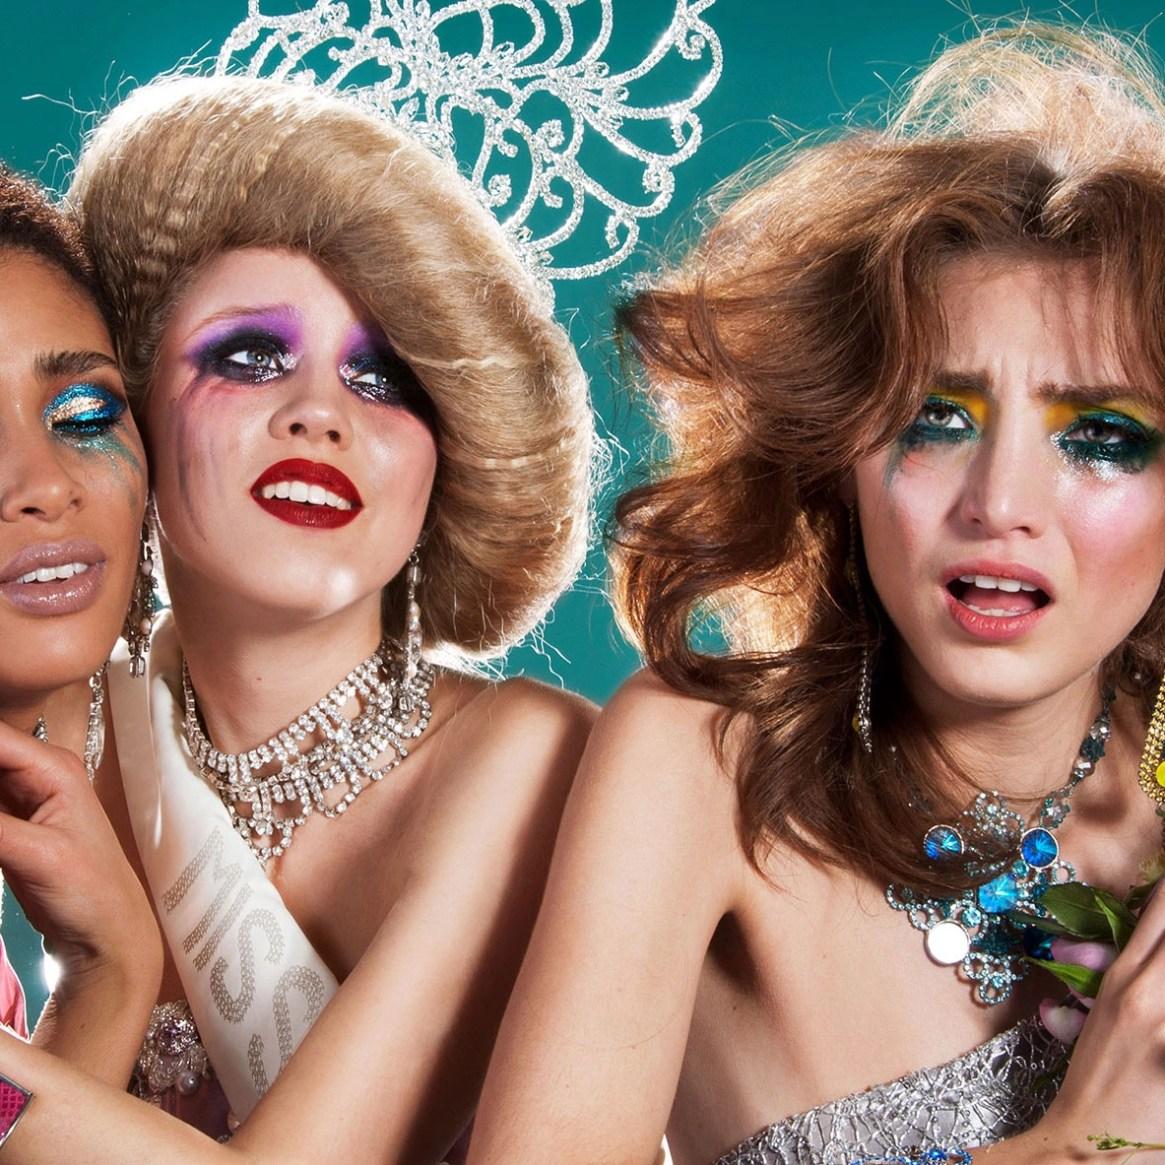 Sorry there has been a mistake FLESH Magazine photo Karla Ledesma, Ignazio Muñoz